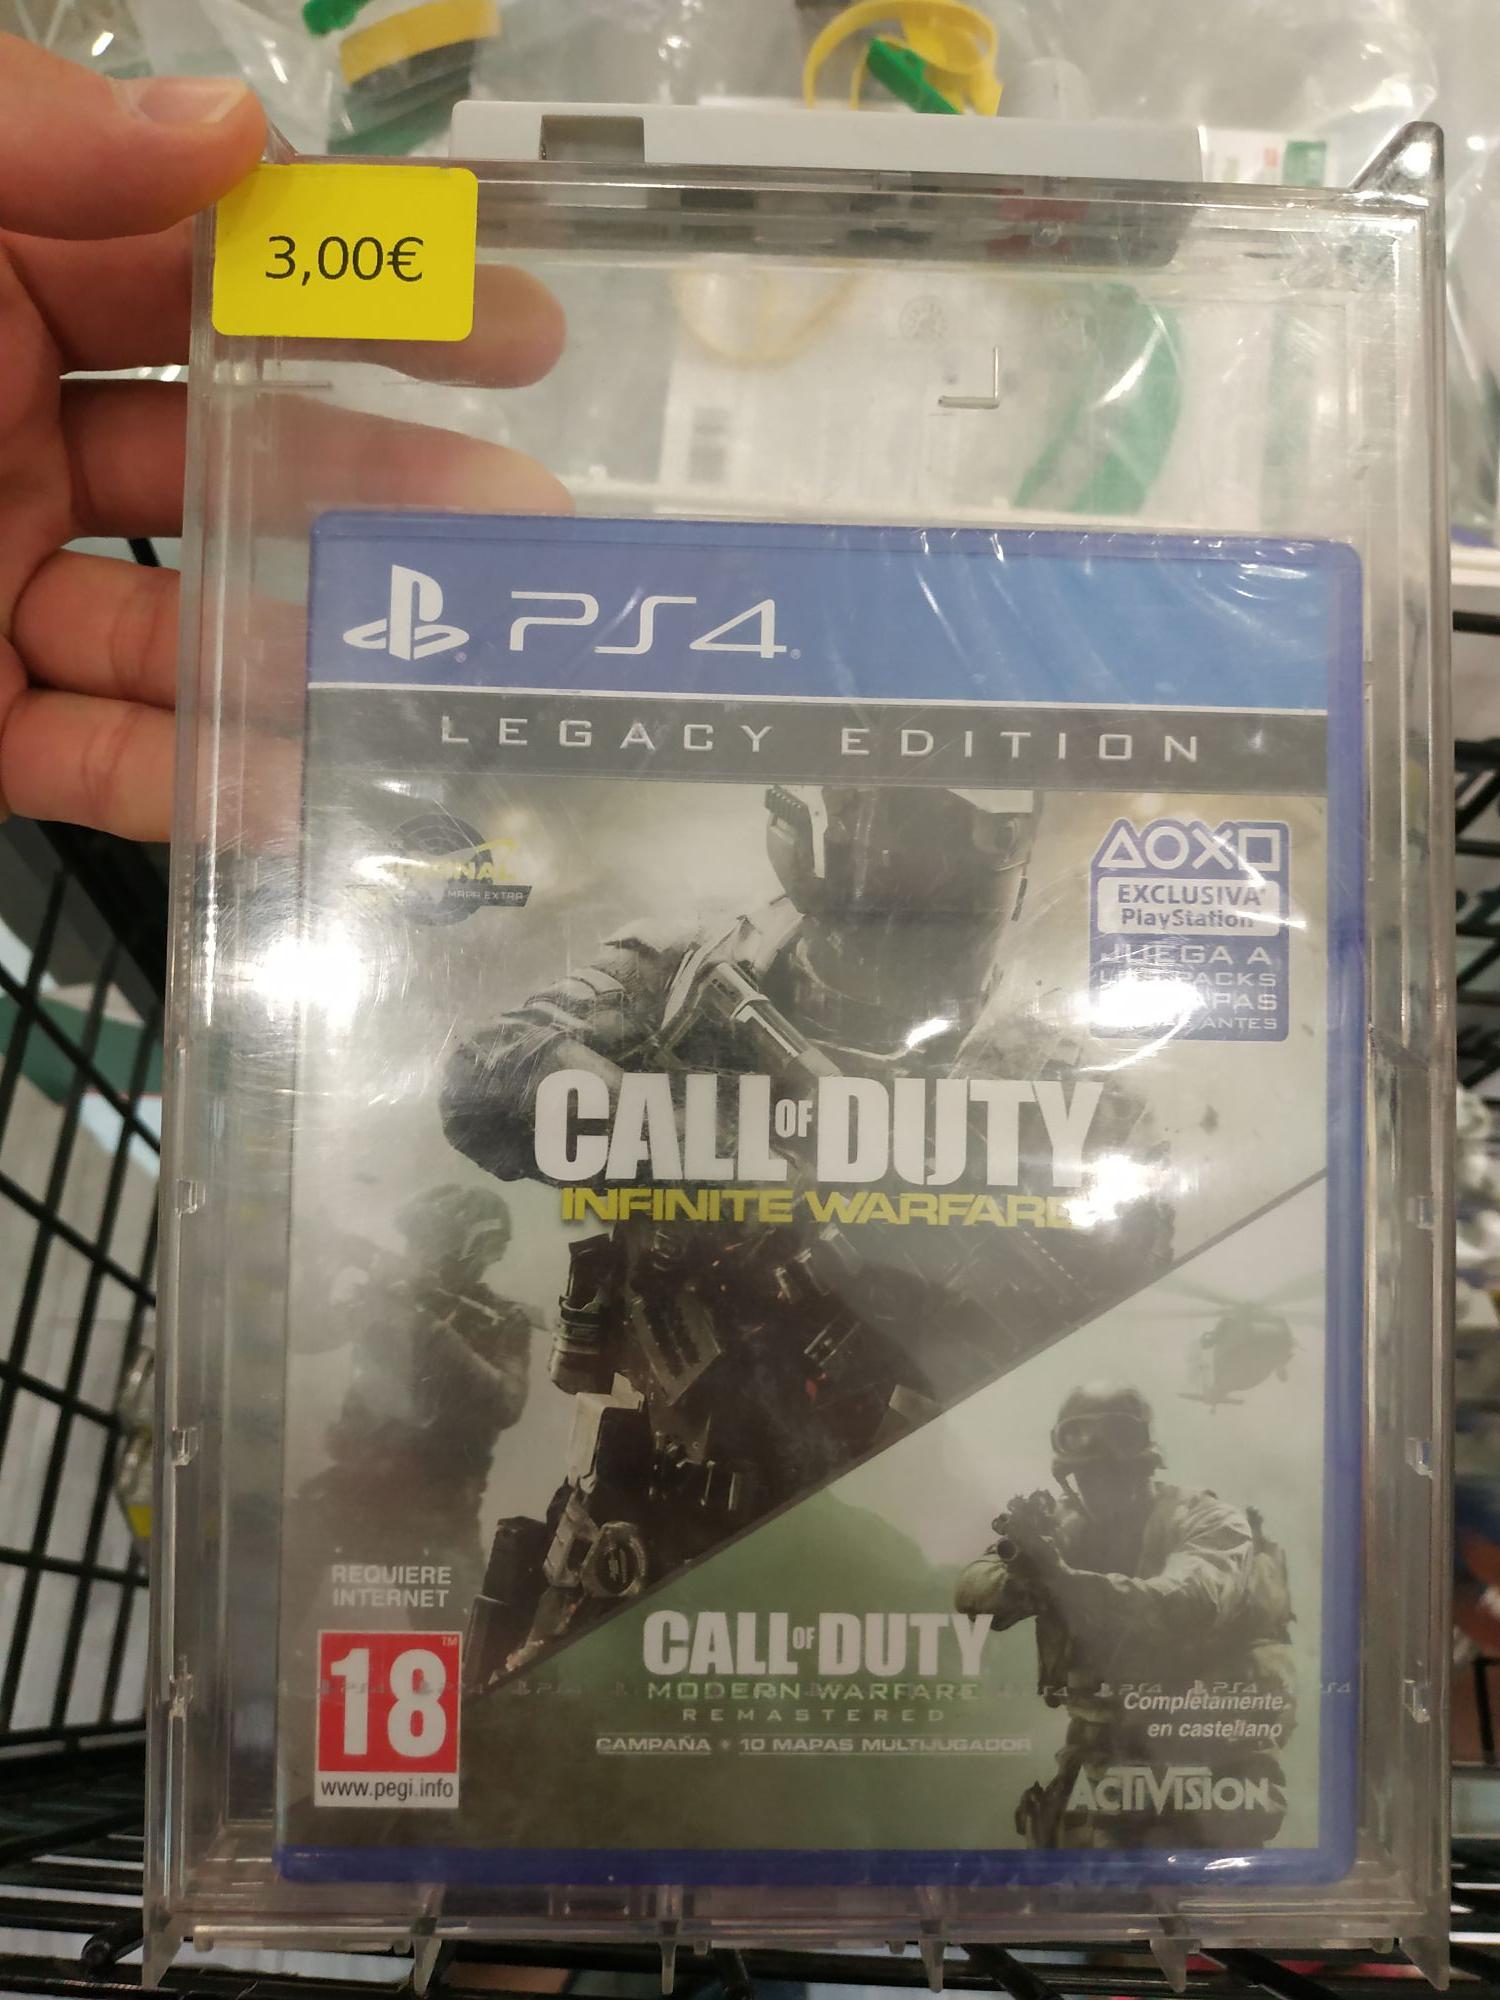 Call of Duty Infinite Warfare/Modern Warfare PS4 en Carrefour Alcobendas